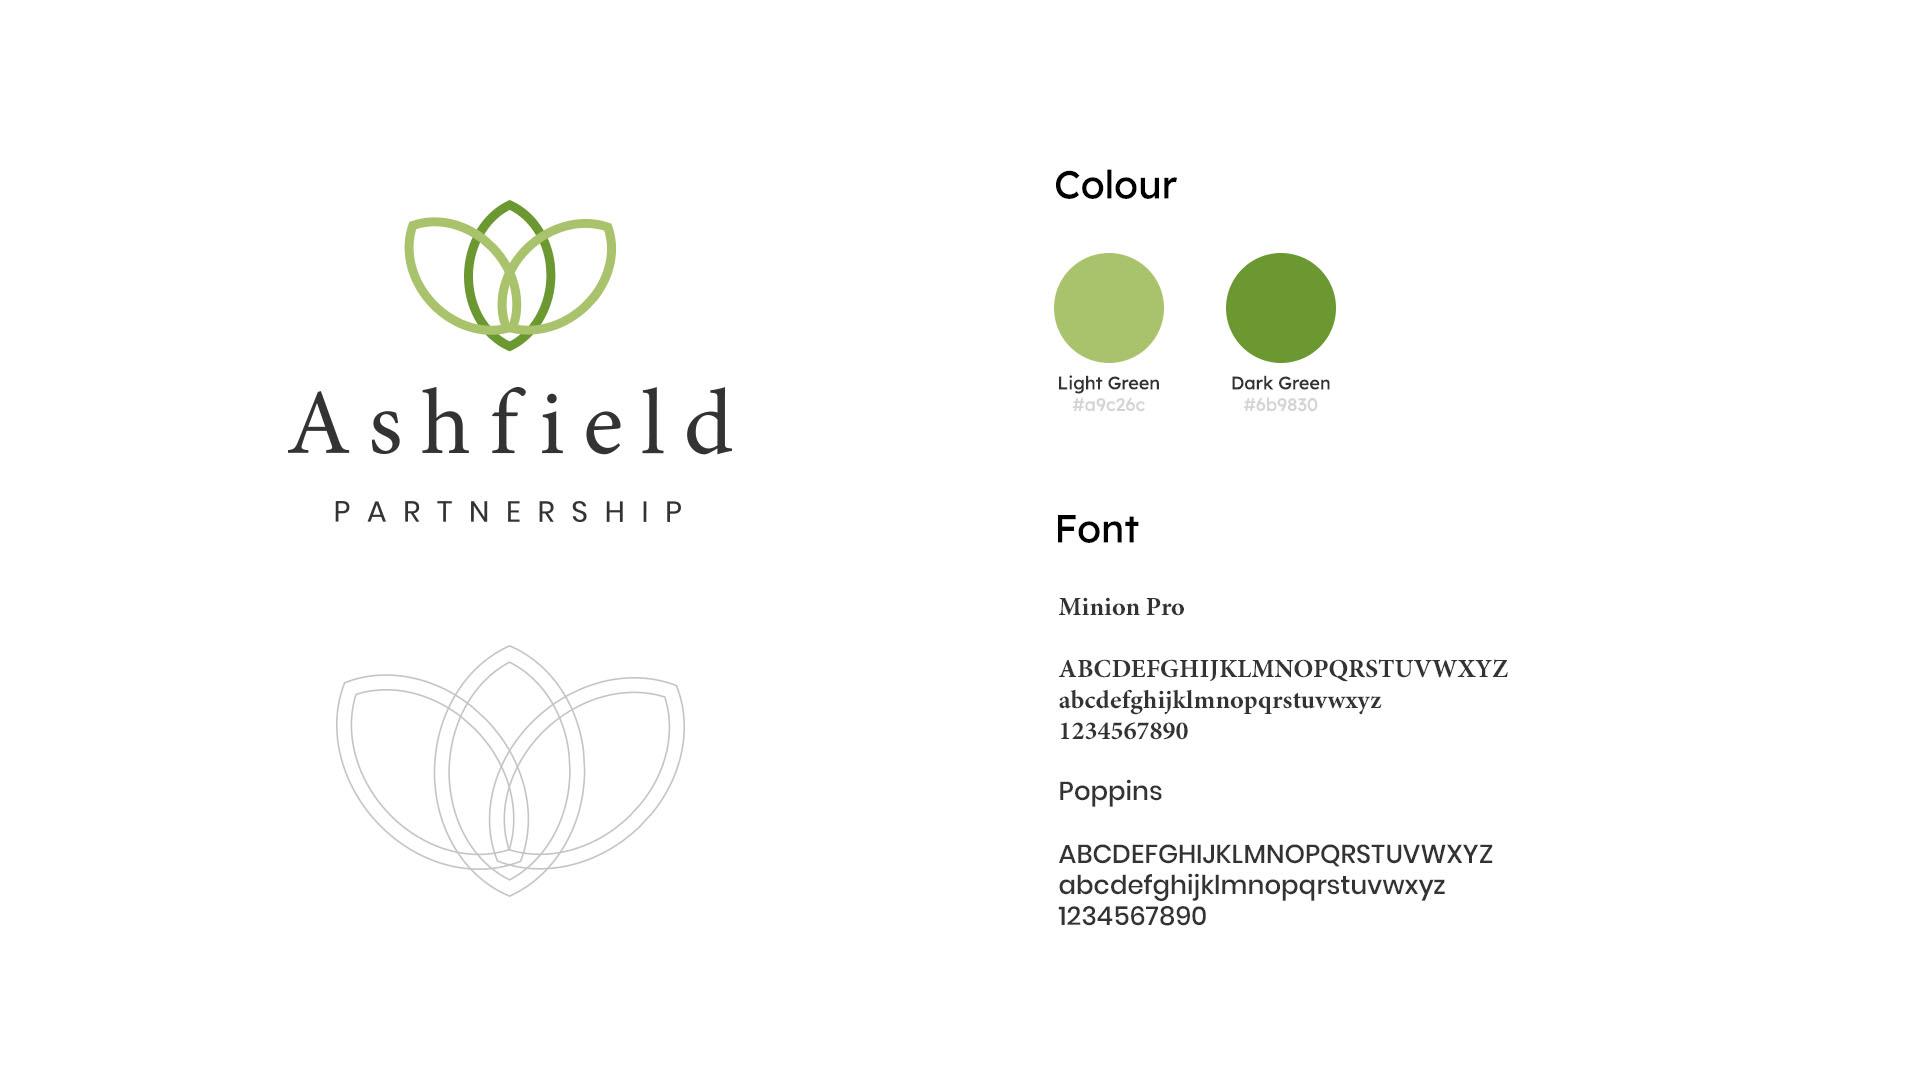 Ashfield Partnership Branding